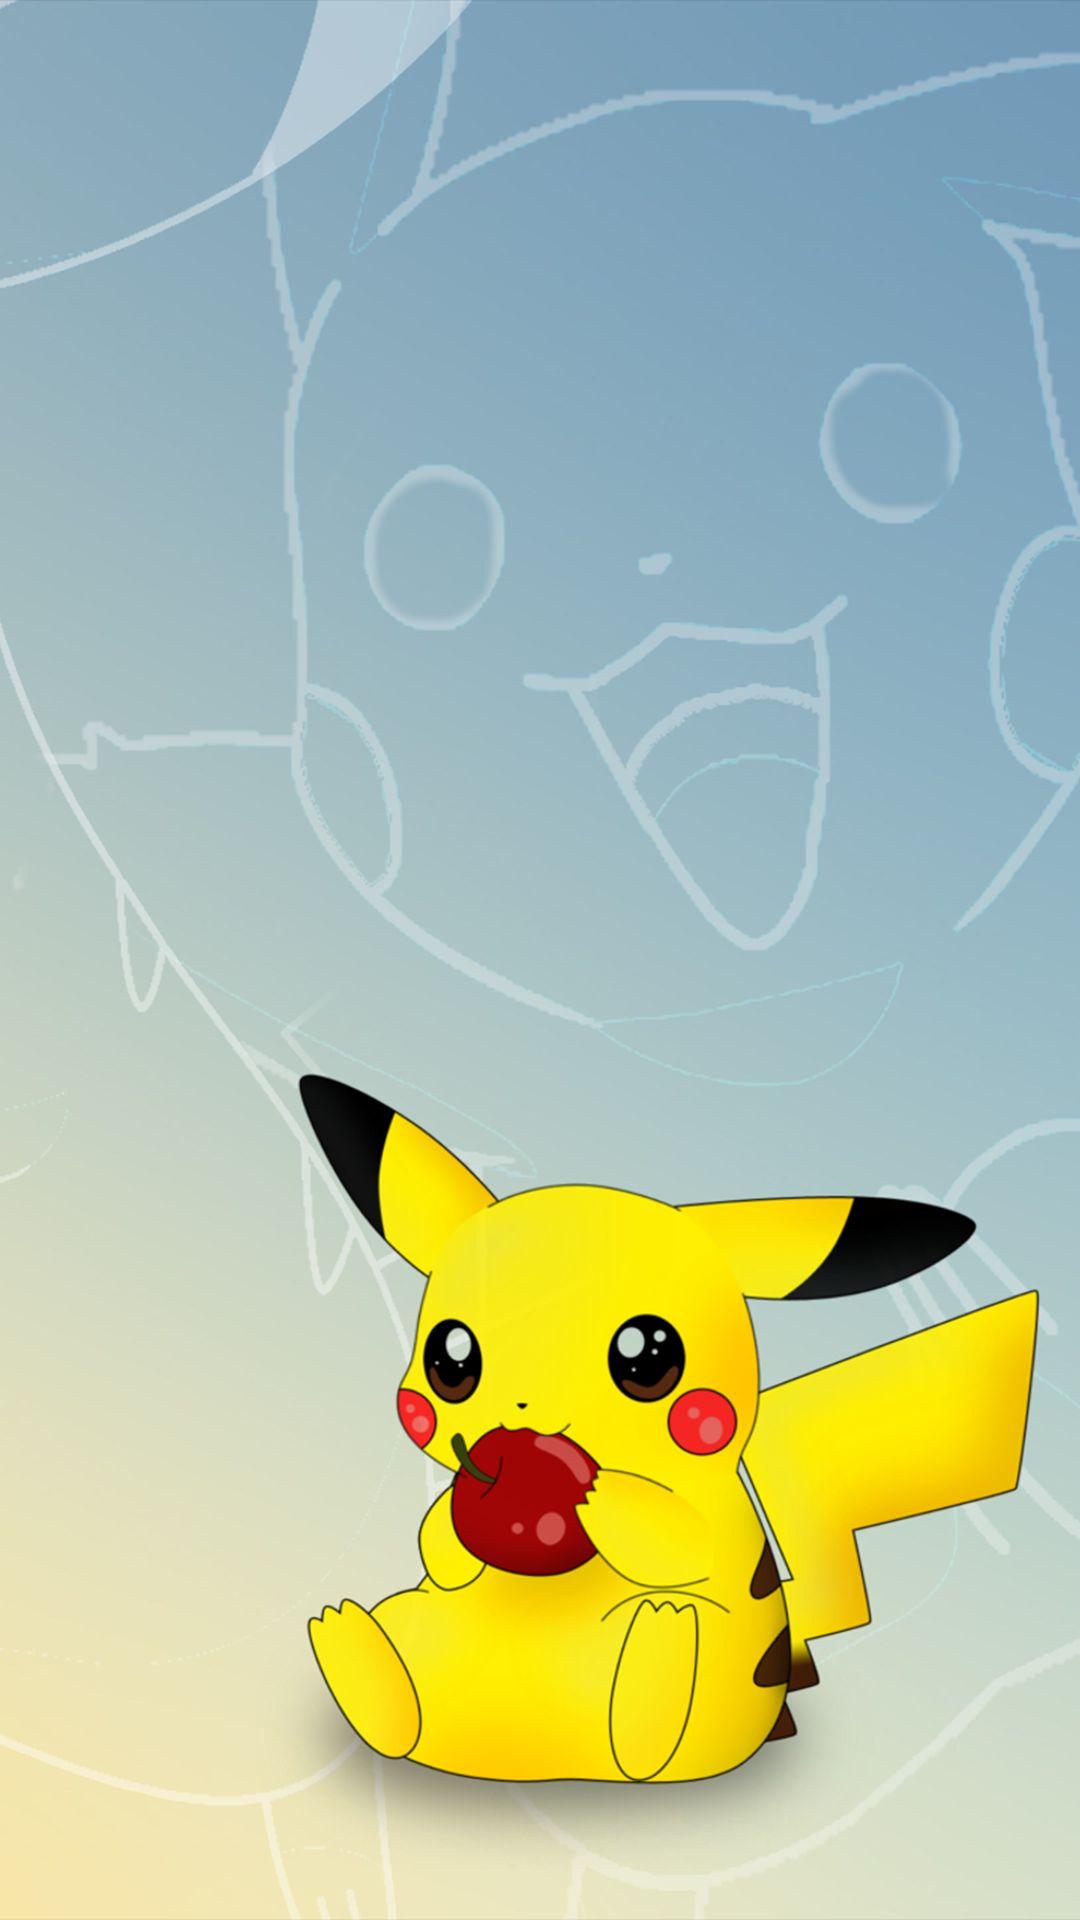 Pokemon Cool HD wallpaper for mobile